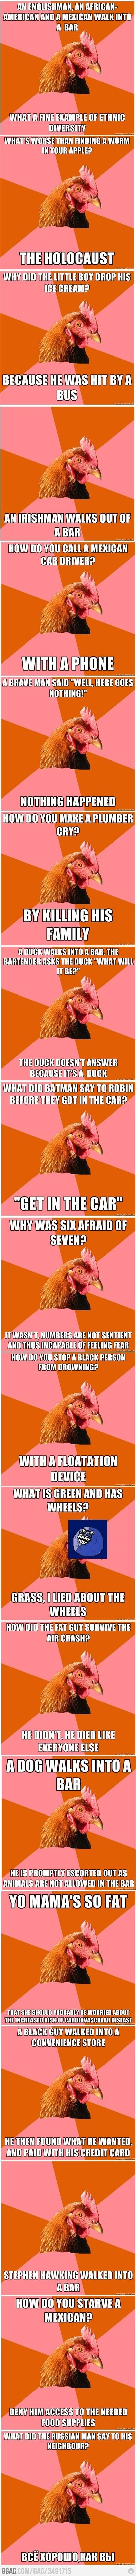 Anti-Joke Chicken at it's finest.